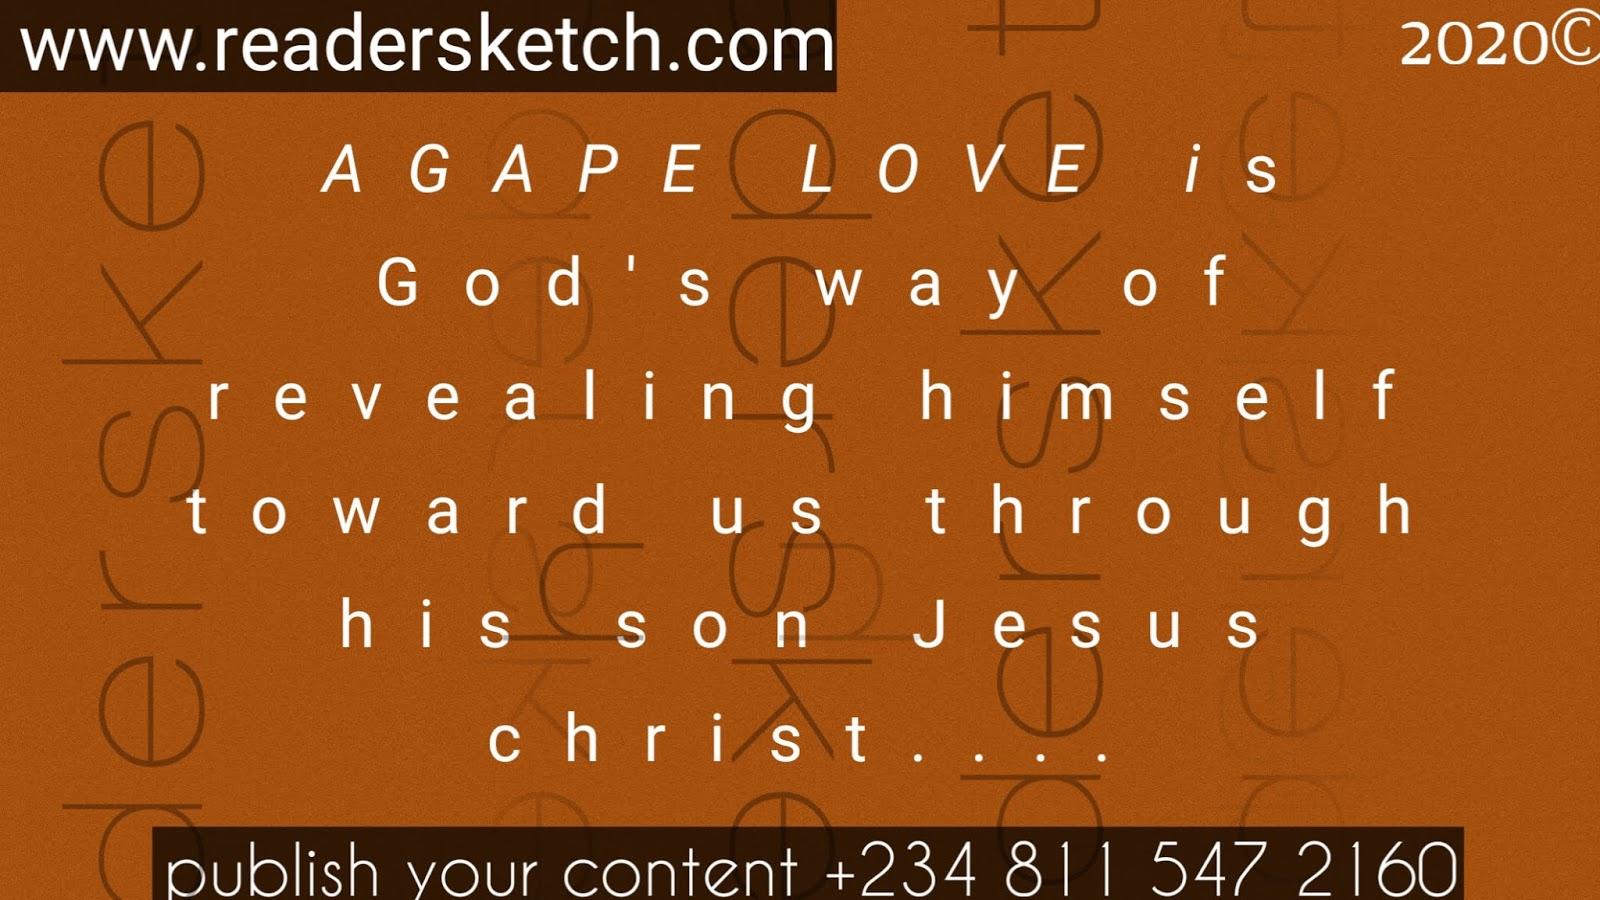 Agape love, Readersketch, lucky, #agapelove, religion, Christ, Christianity, love, #love, how to love?